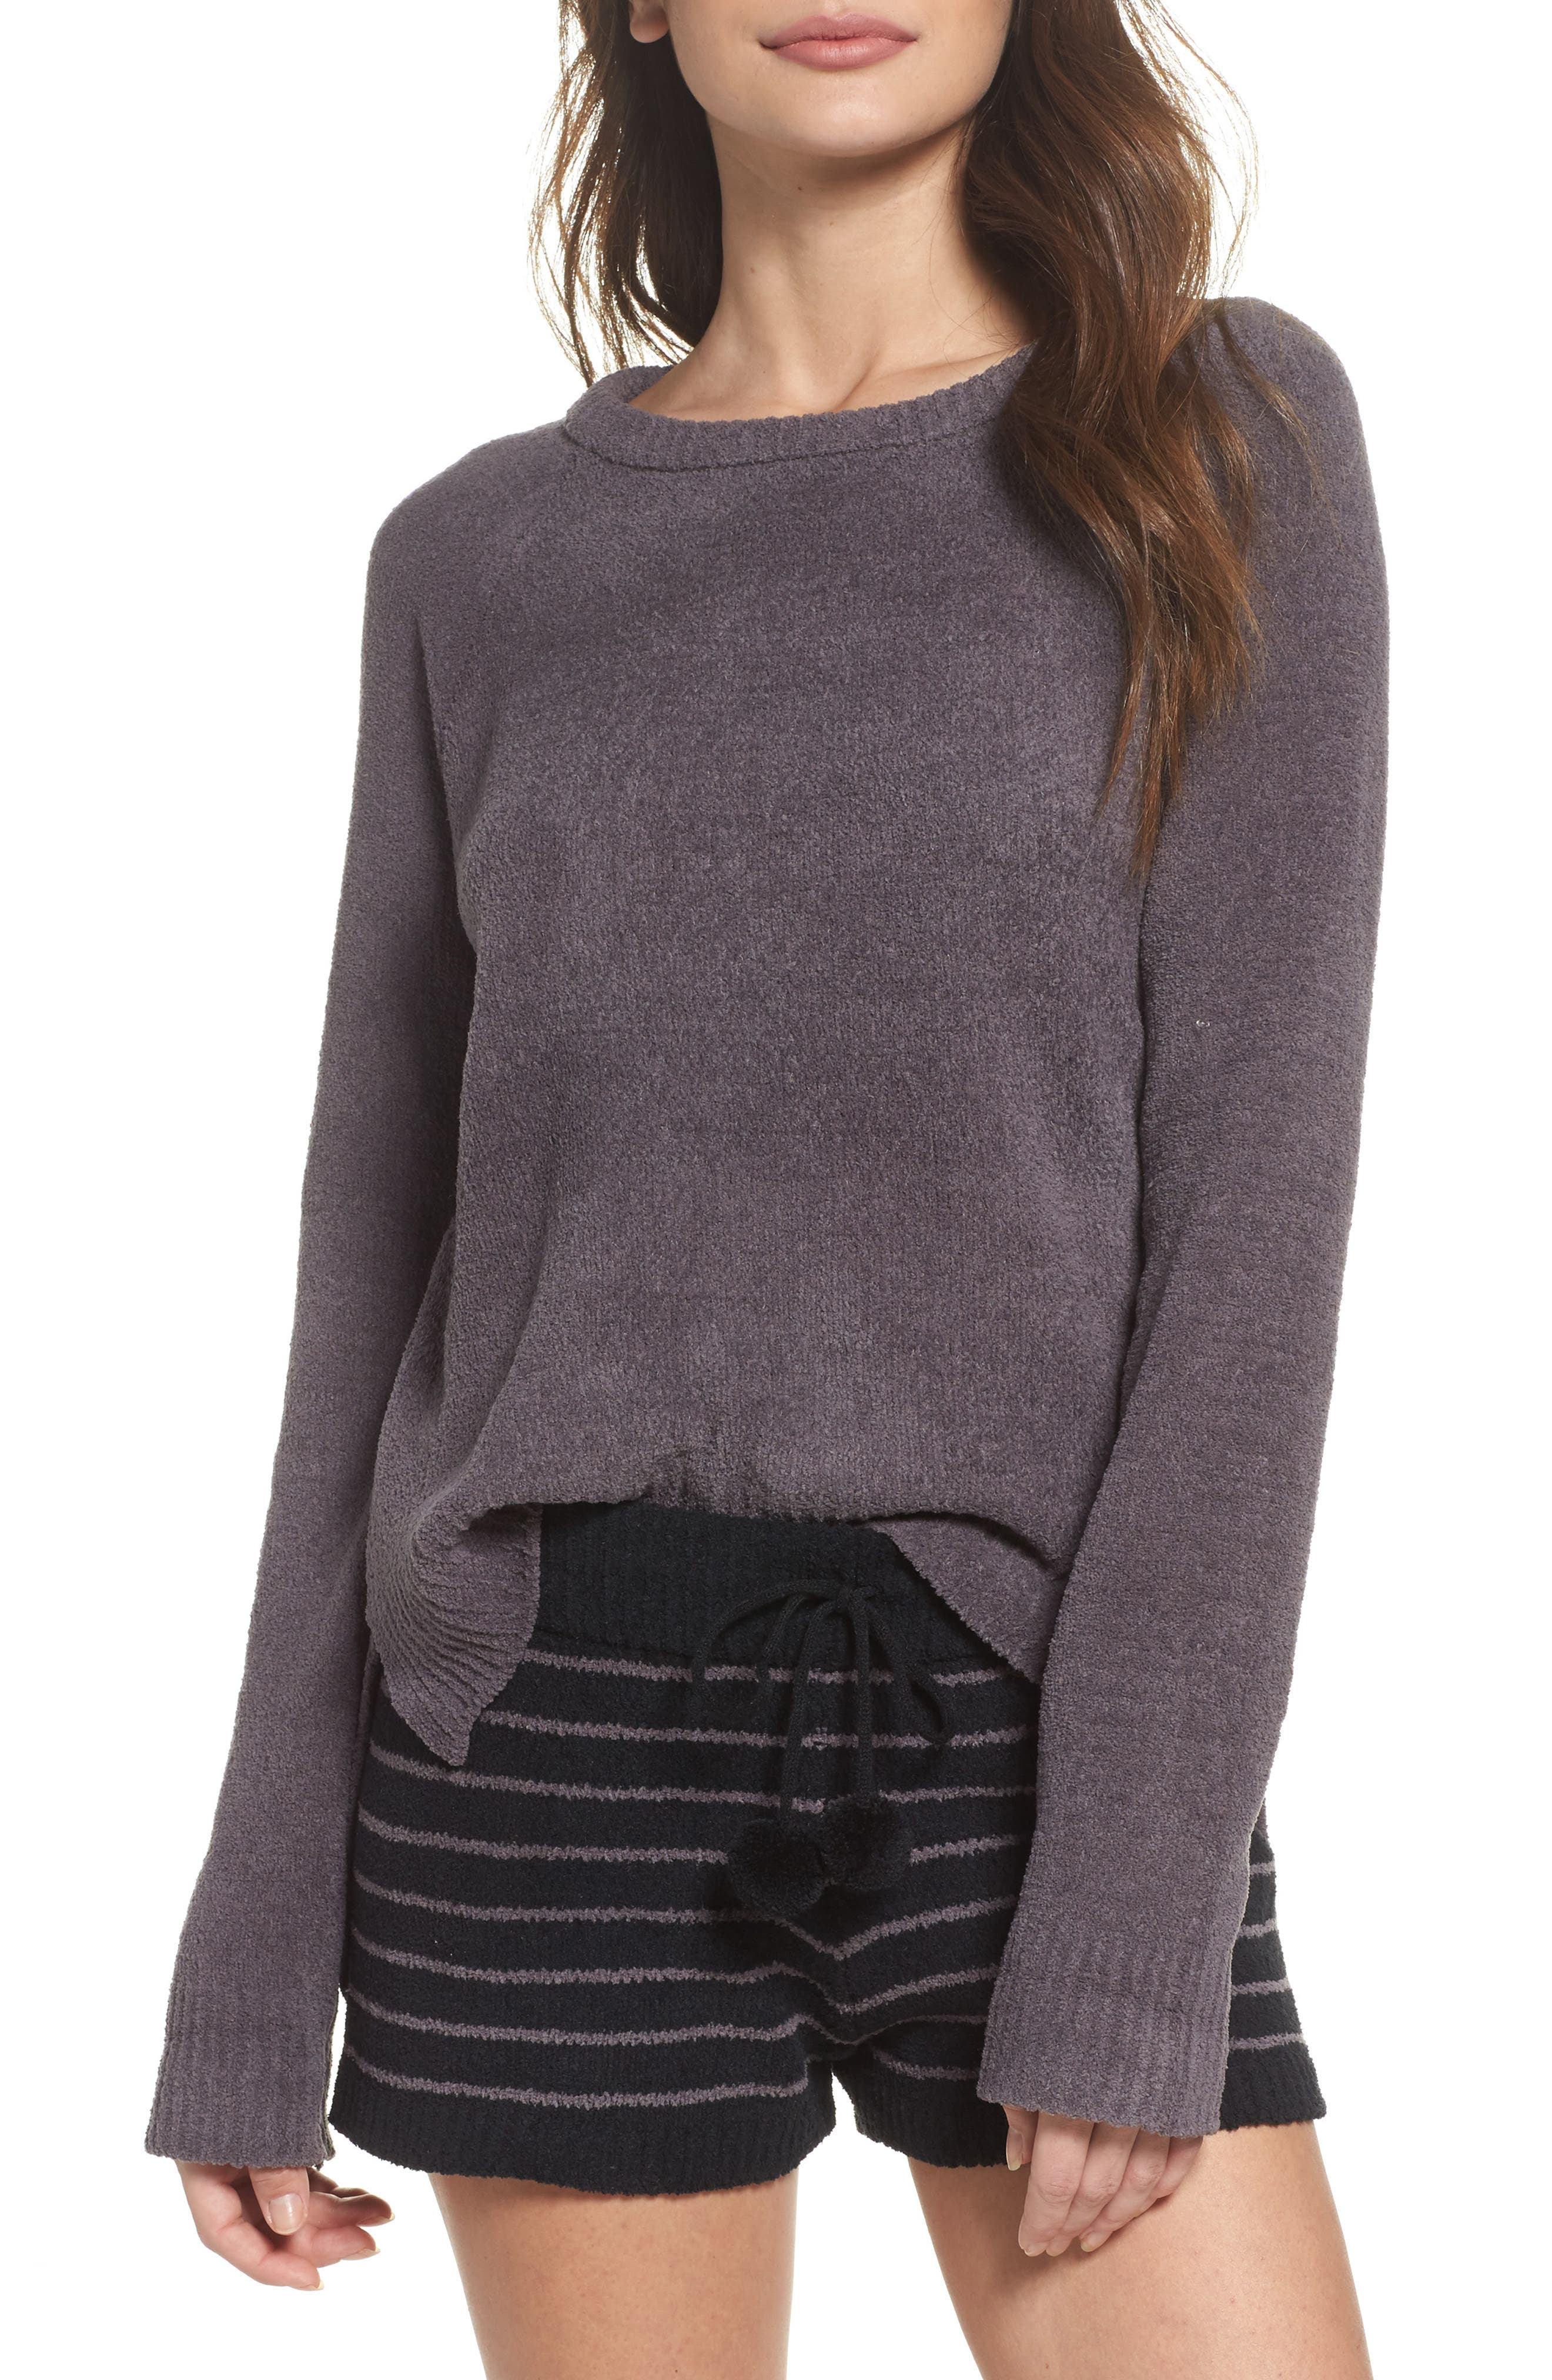 Alternate Image 1 Selected - Honeydew Intimates Marshmallow Sweatshirt